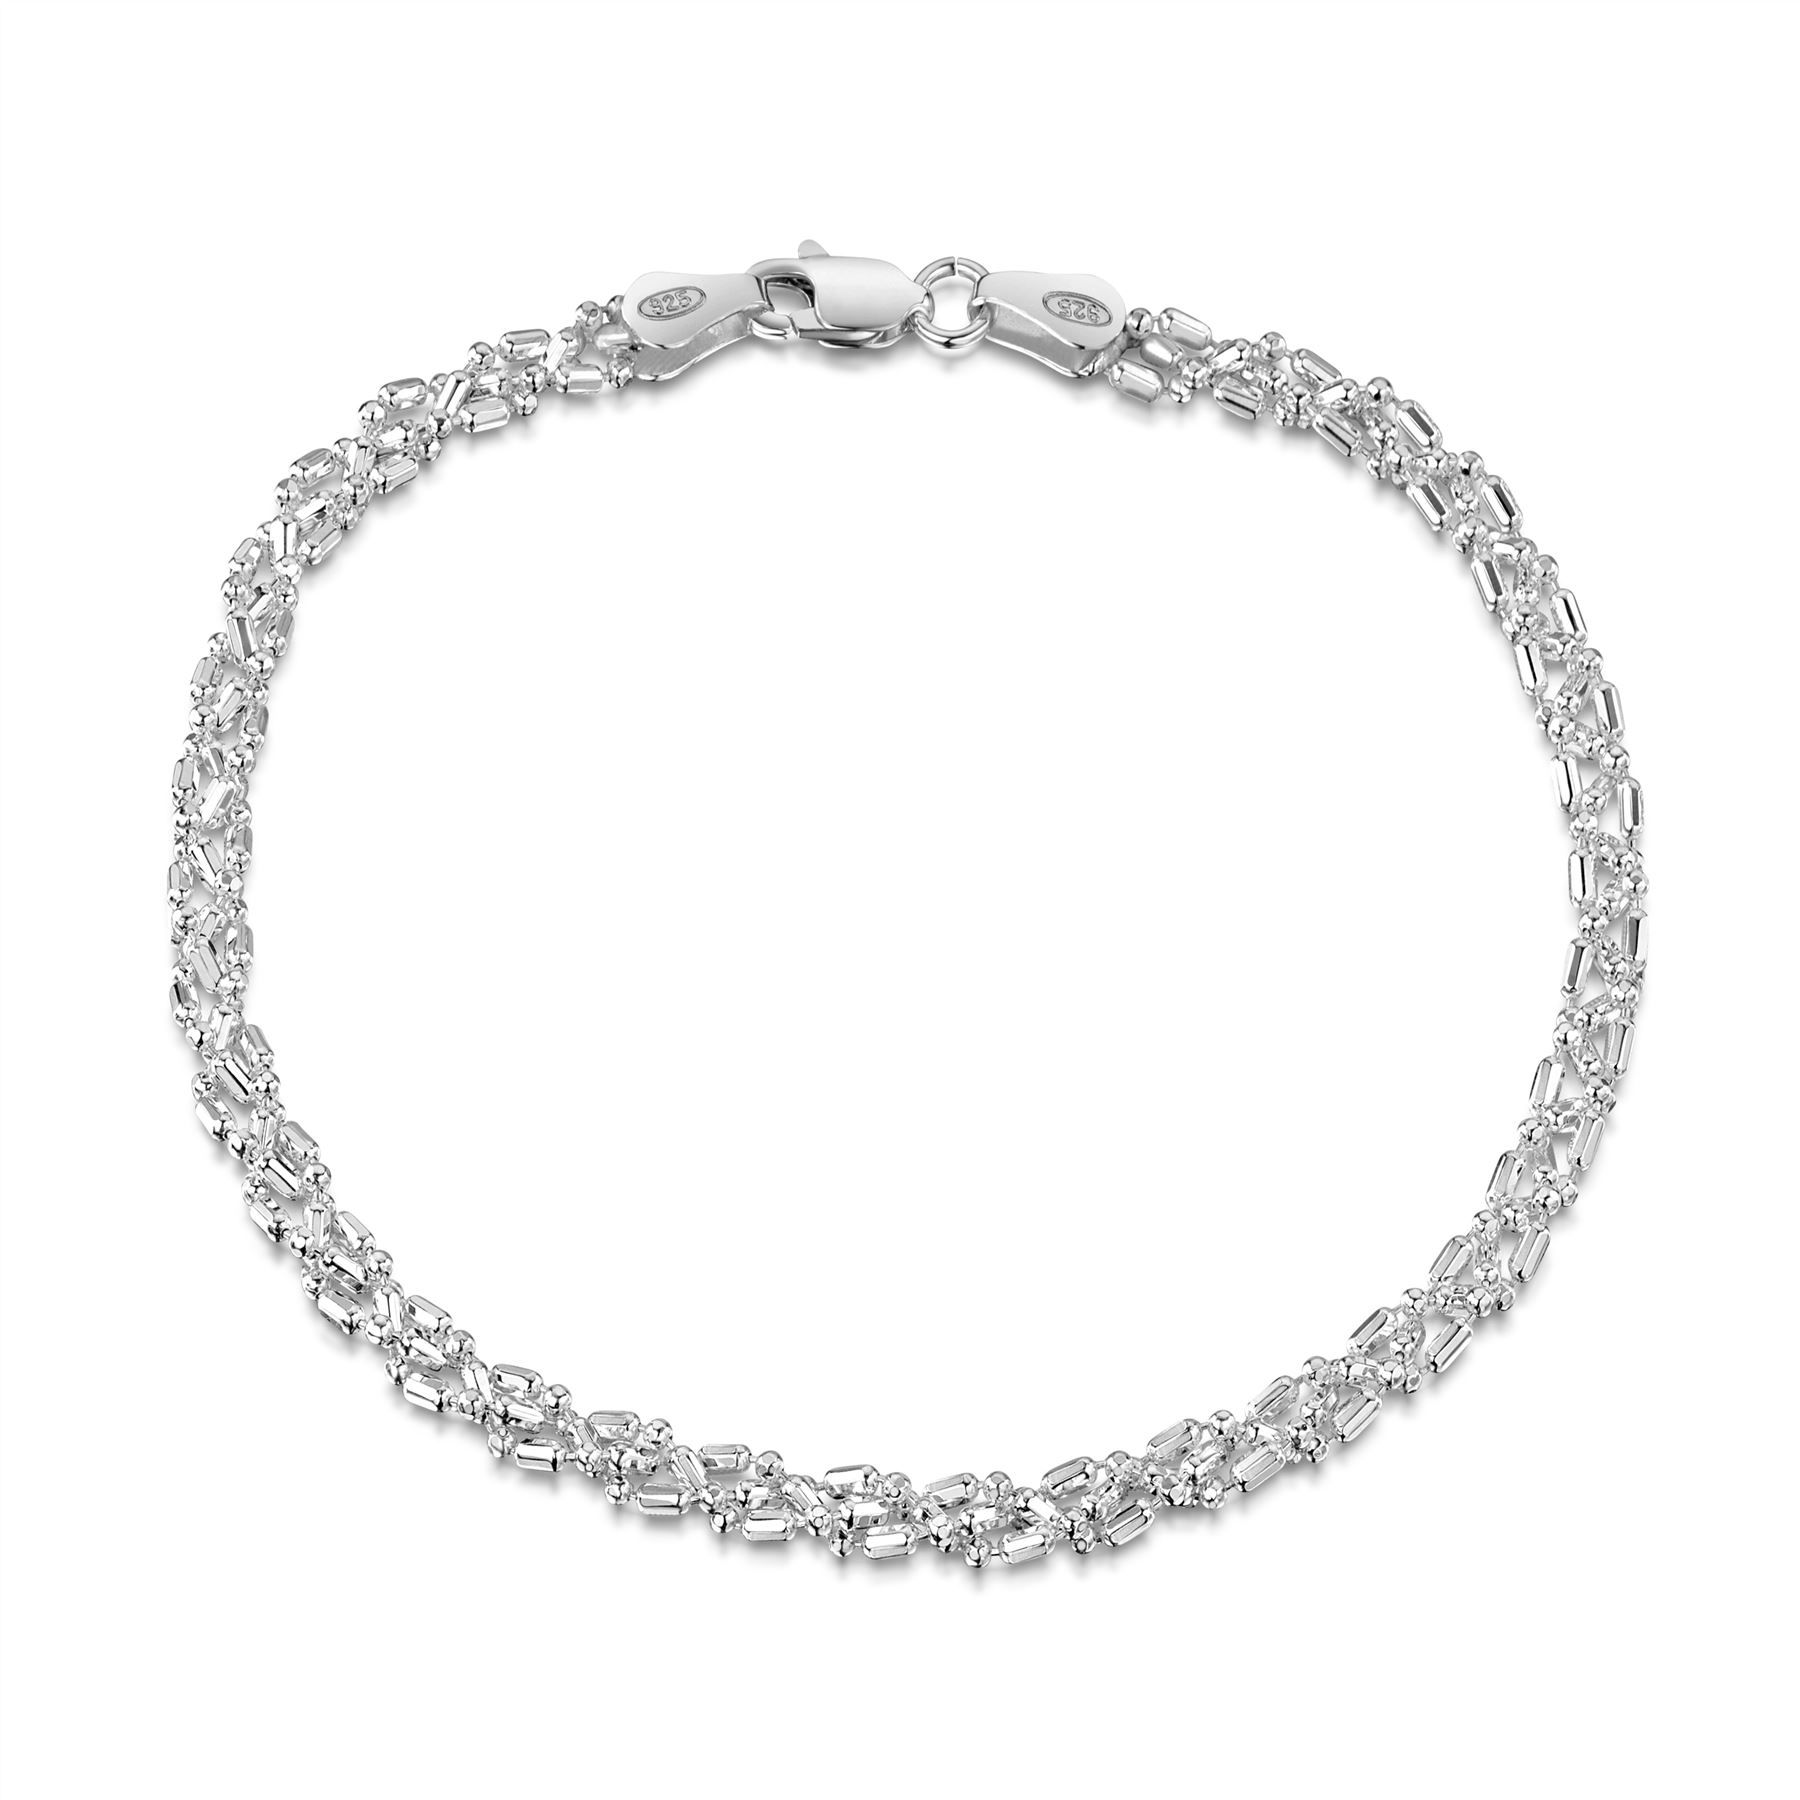 Amberta-Pulsera-en-Autentica-Plata-De-Ley-925-Brazalete-Precioso-para-Mujer miniatura 83